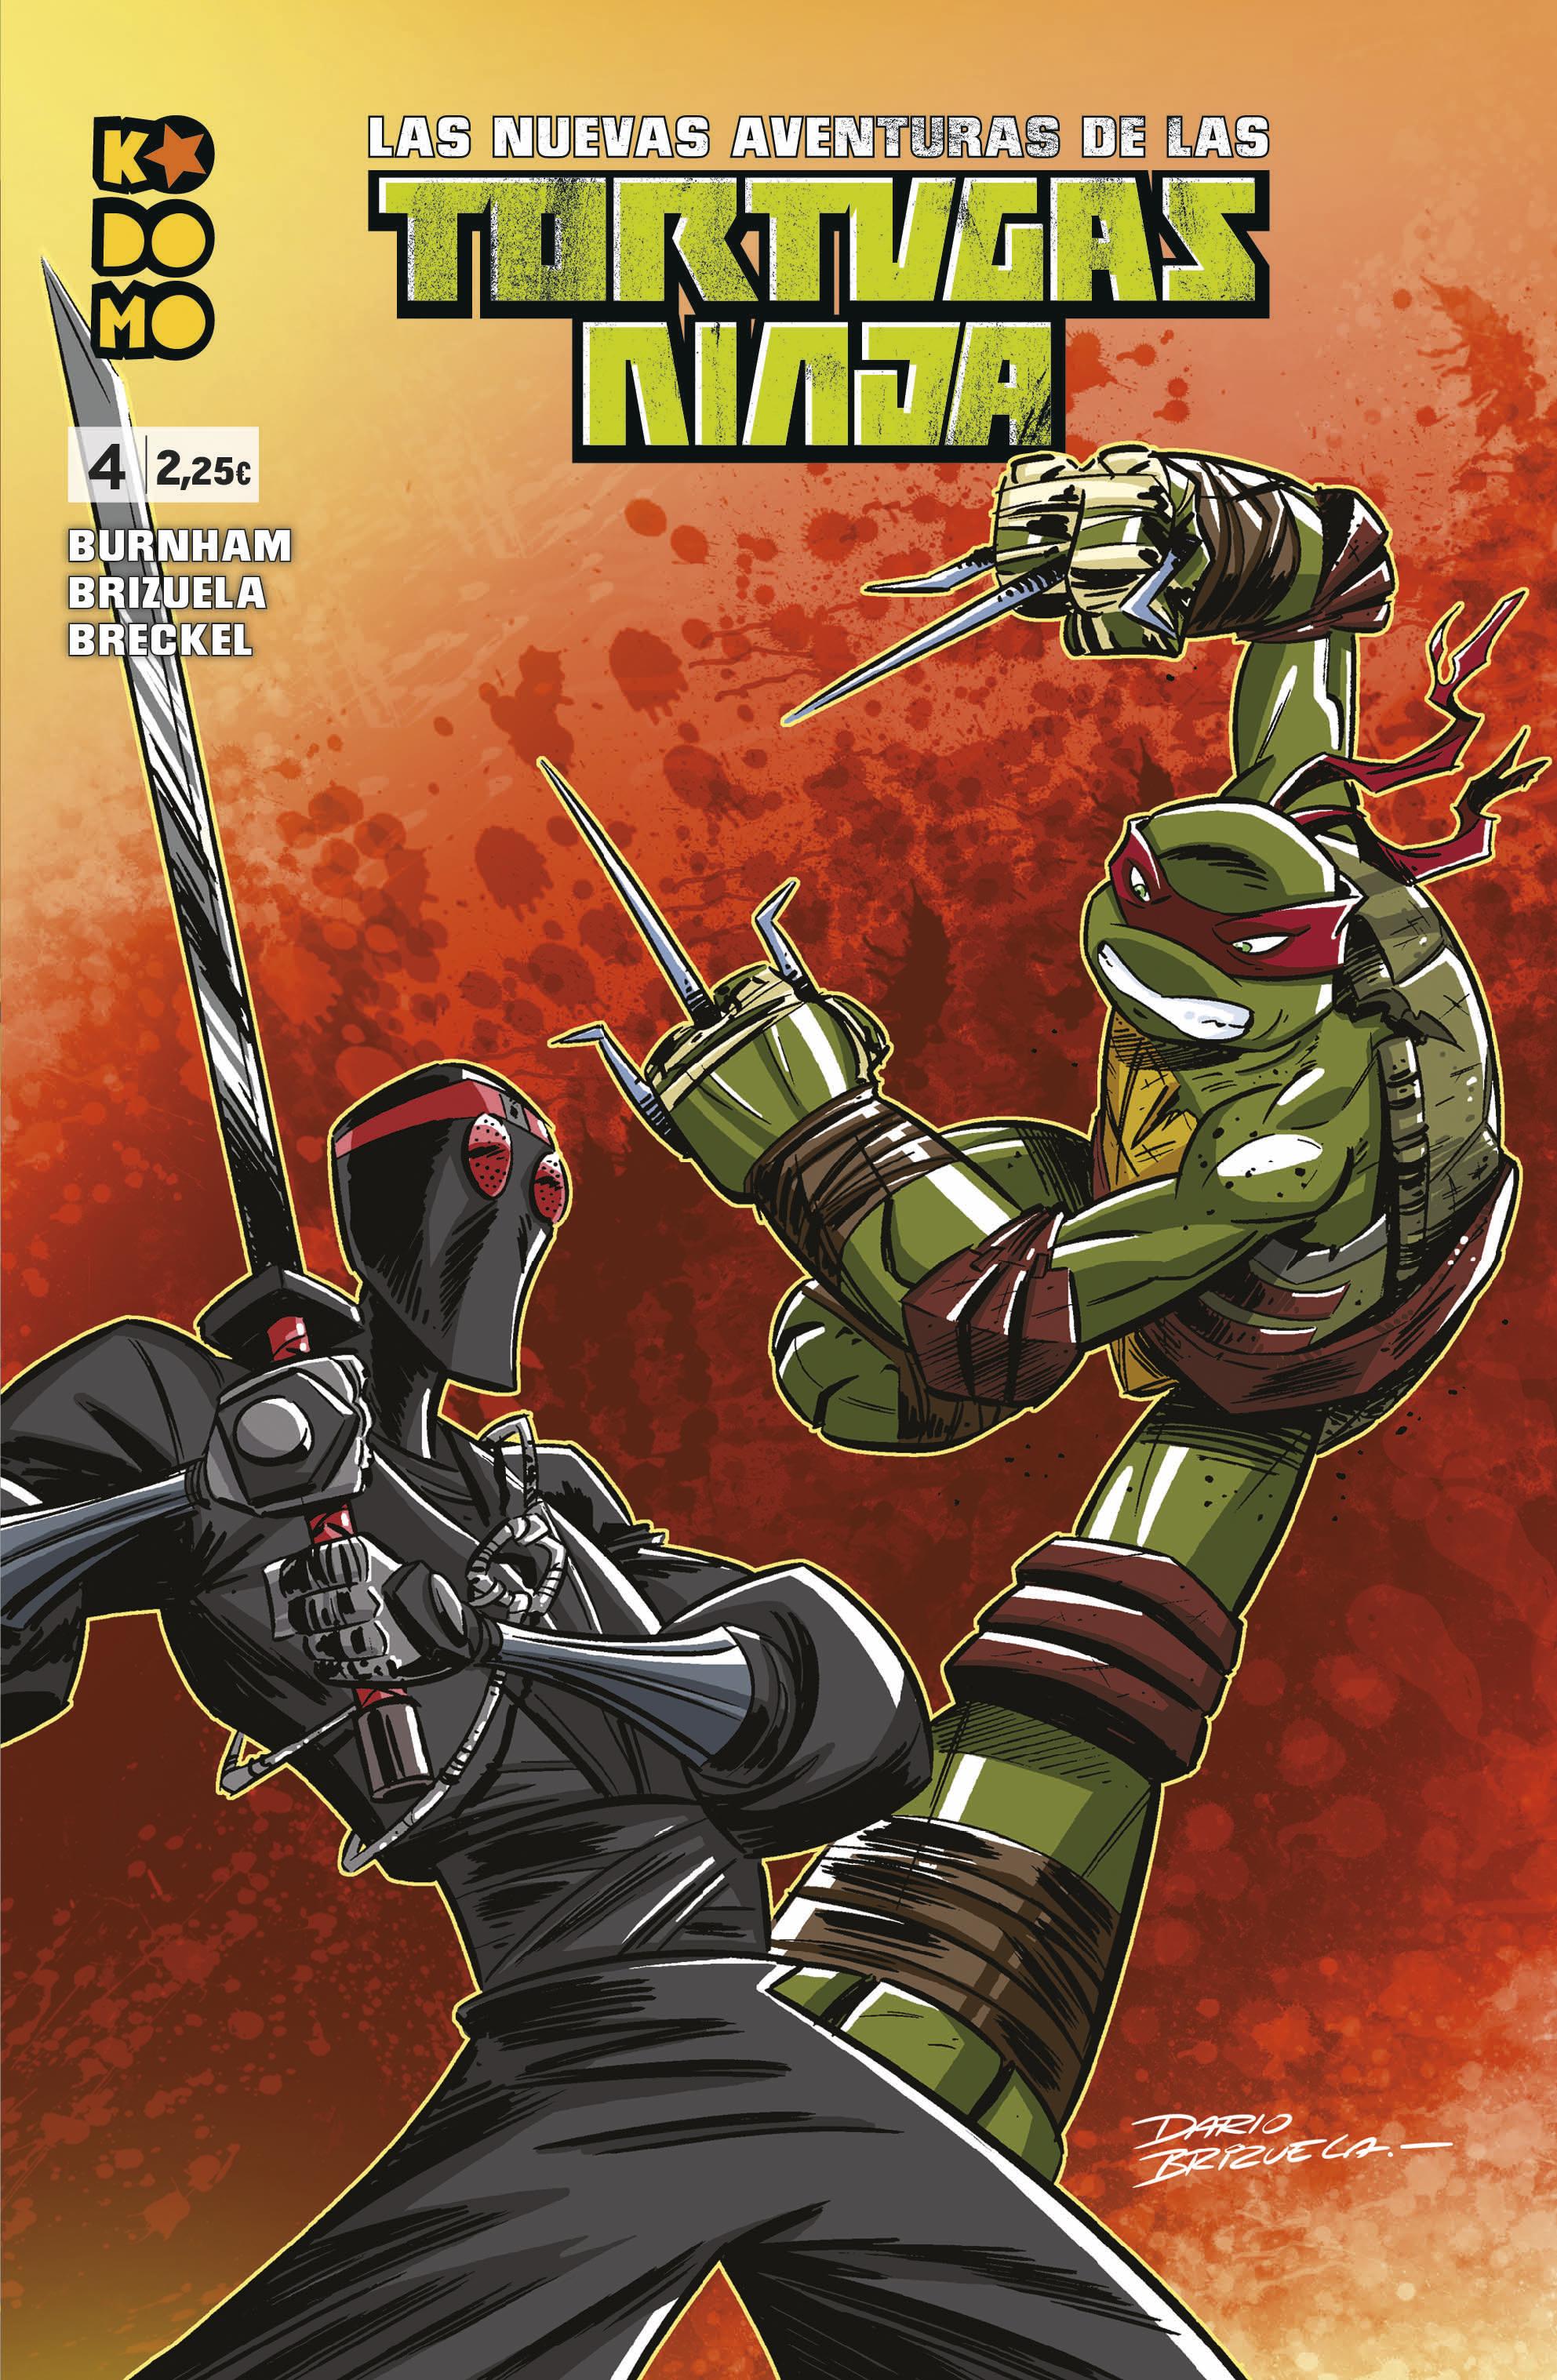 Las nuevas aventuras de las Tortugas Ninja núm. 4